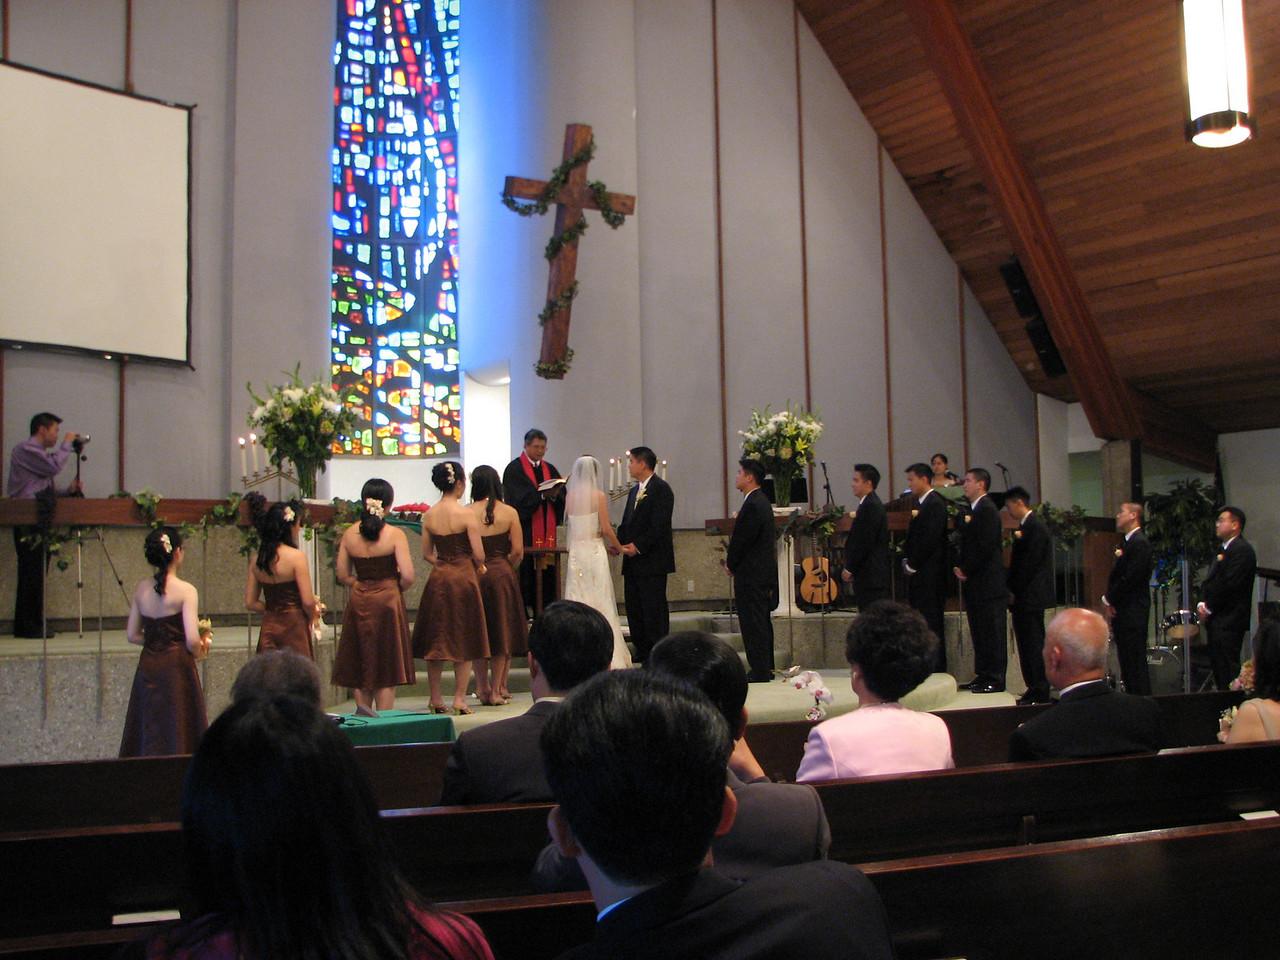 2007 06 09 Sat - Exchanging of vows 1